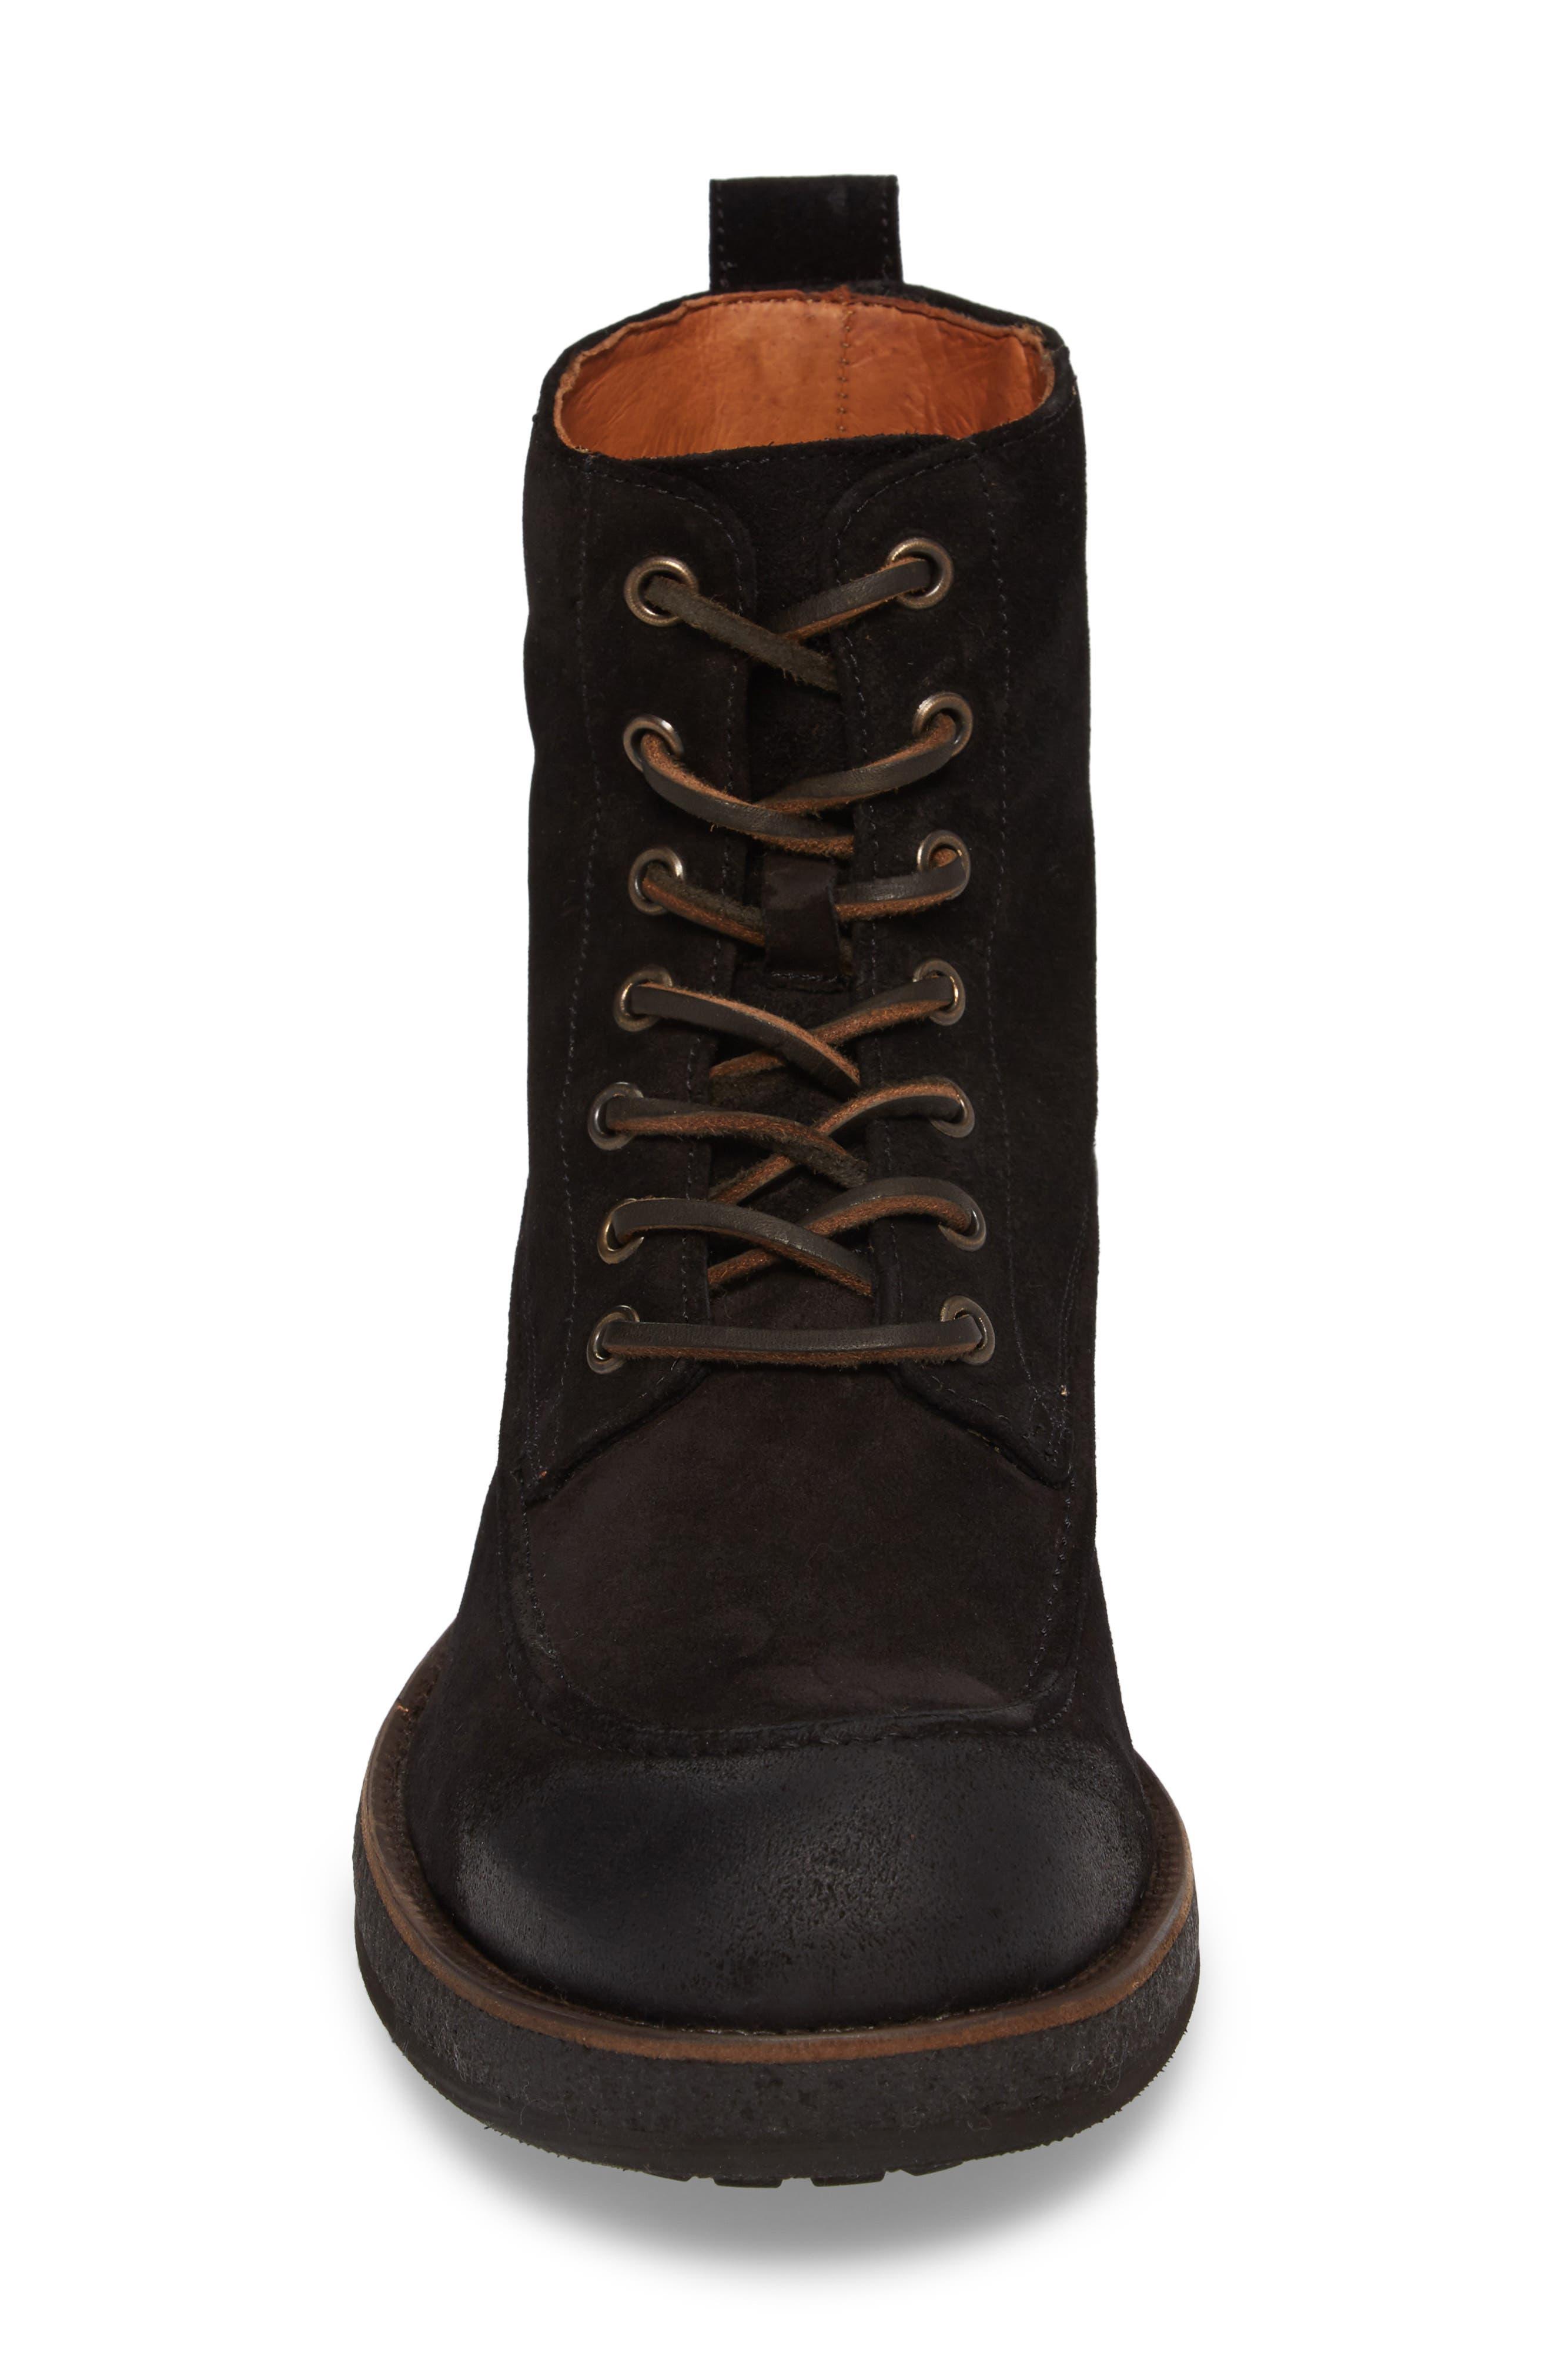 Rainier Waxed Work Boot,                             Alternate thumbnail 4, color,                             Black Waxed Suede